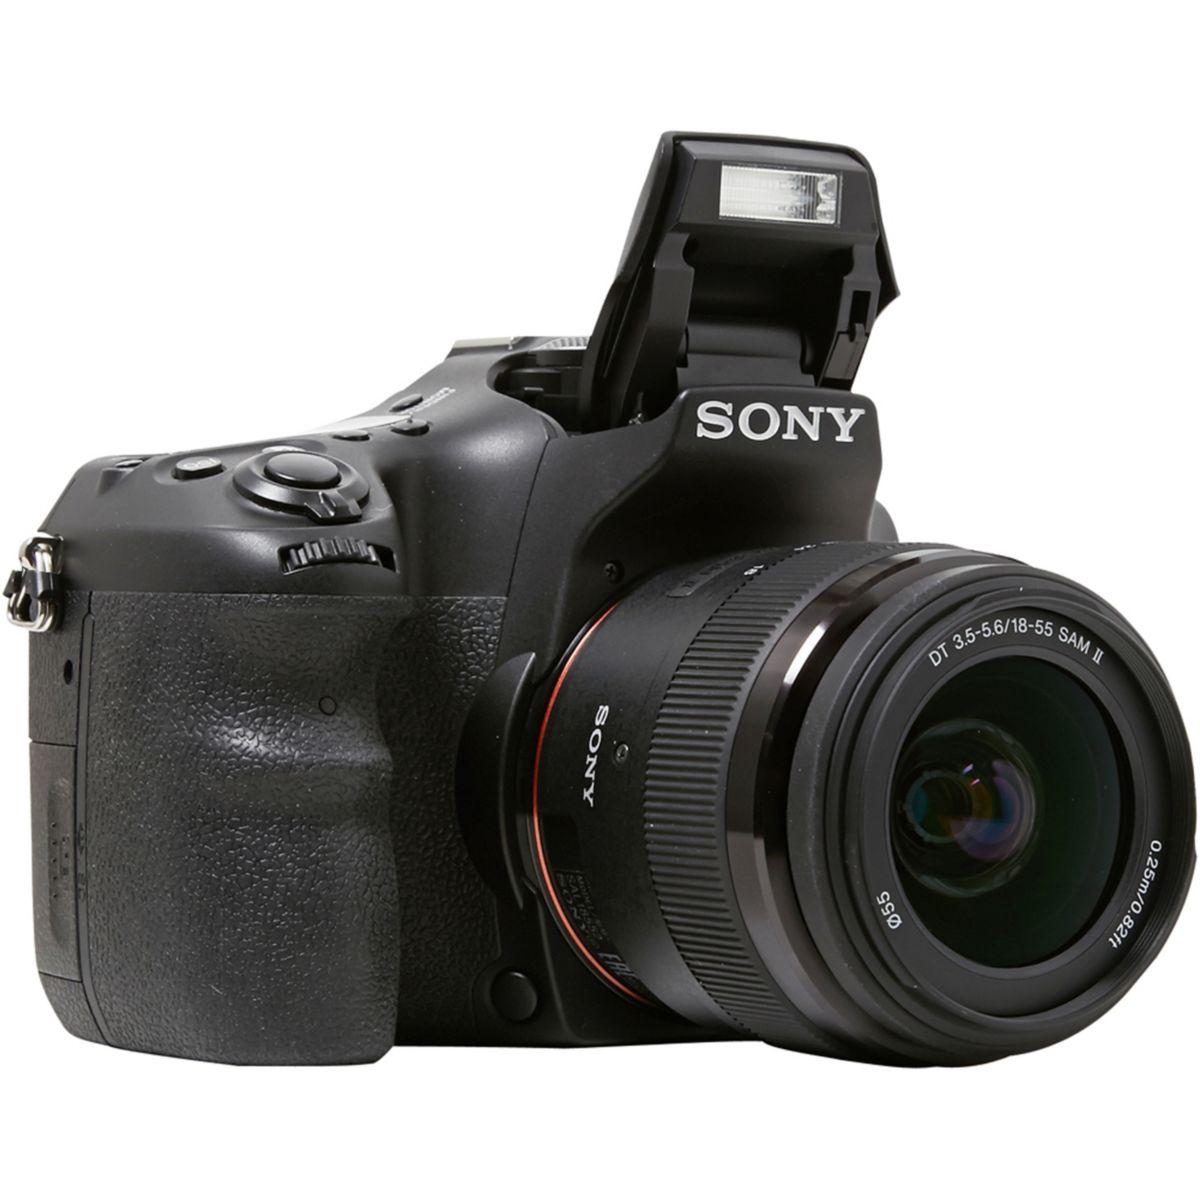 Appareil photo Reflex SONY A68 + 18-55mm